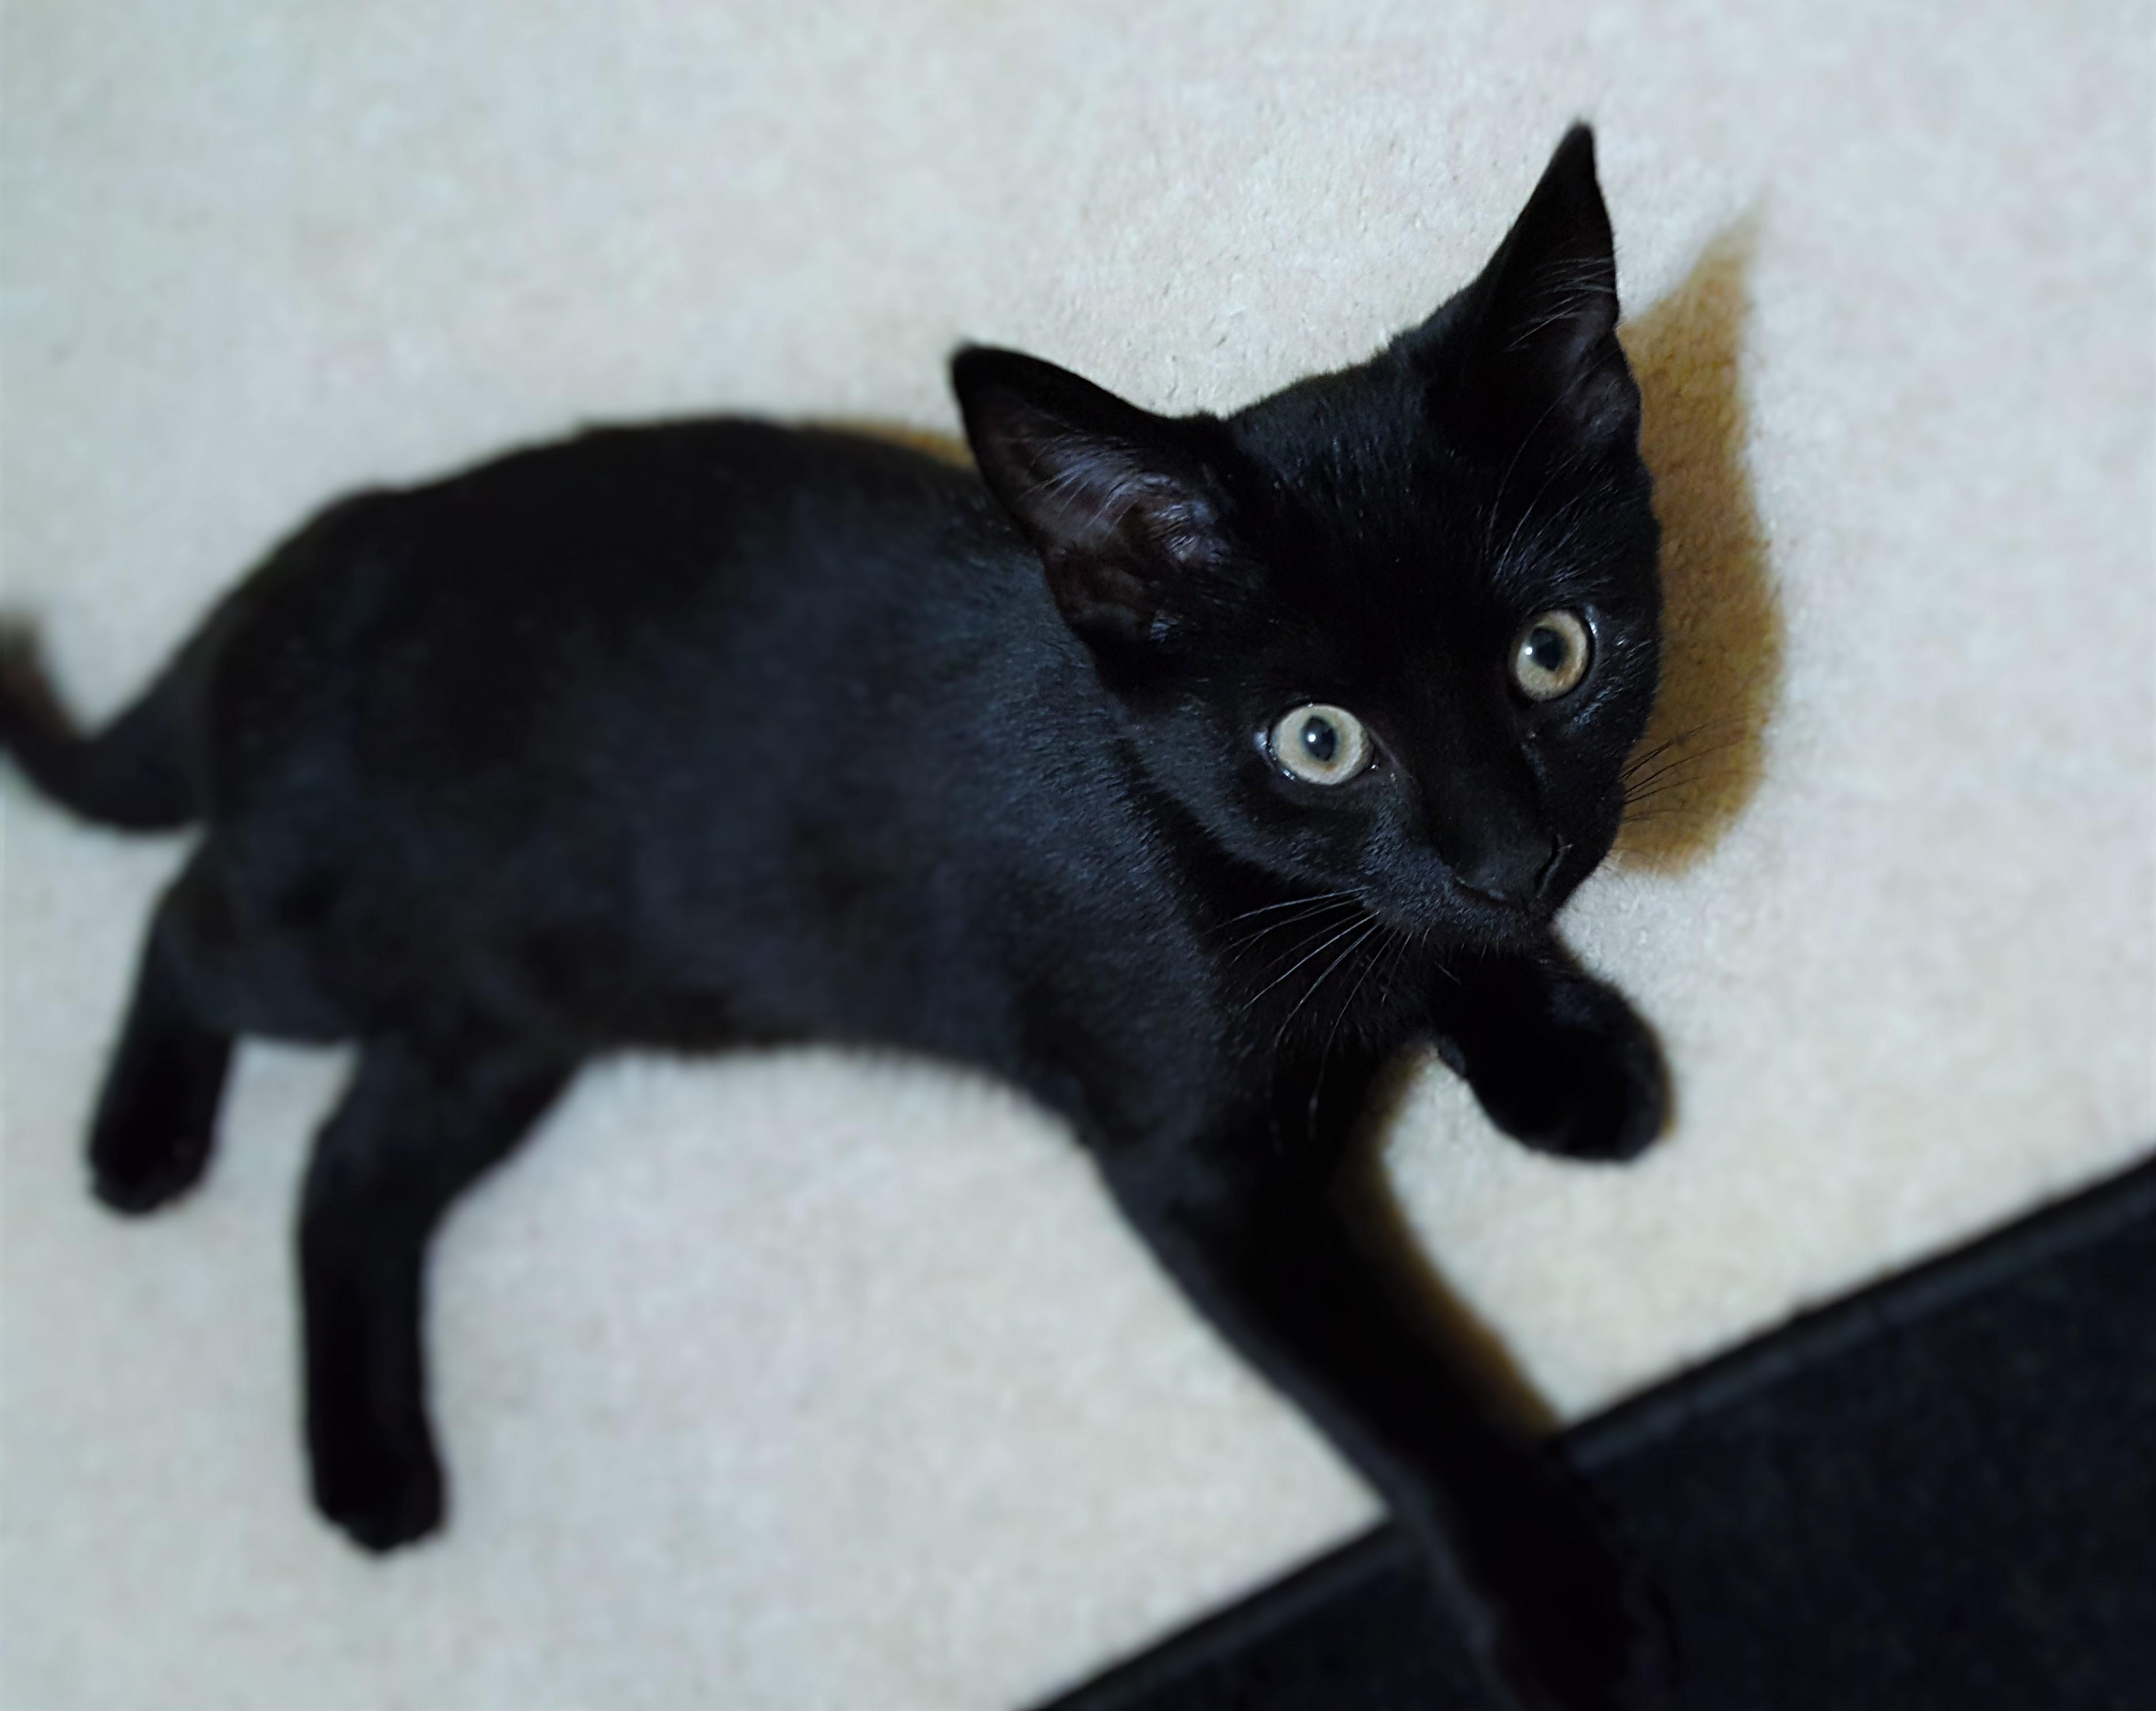 Just A Little Kithttps I Redd It R2aynzjofyp01 Jpg Puppies And Kitties Black Kitten Cute Animals